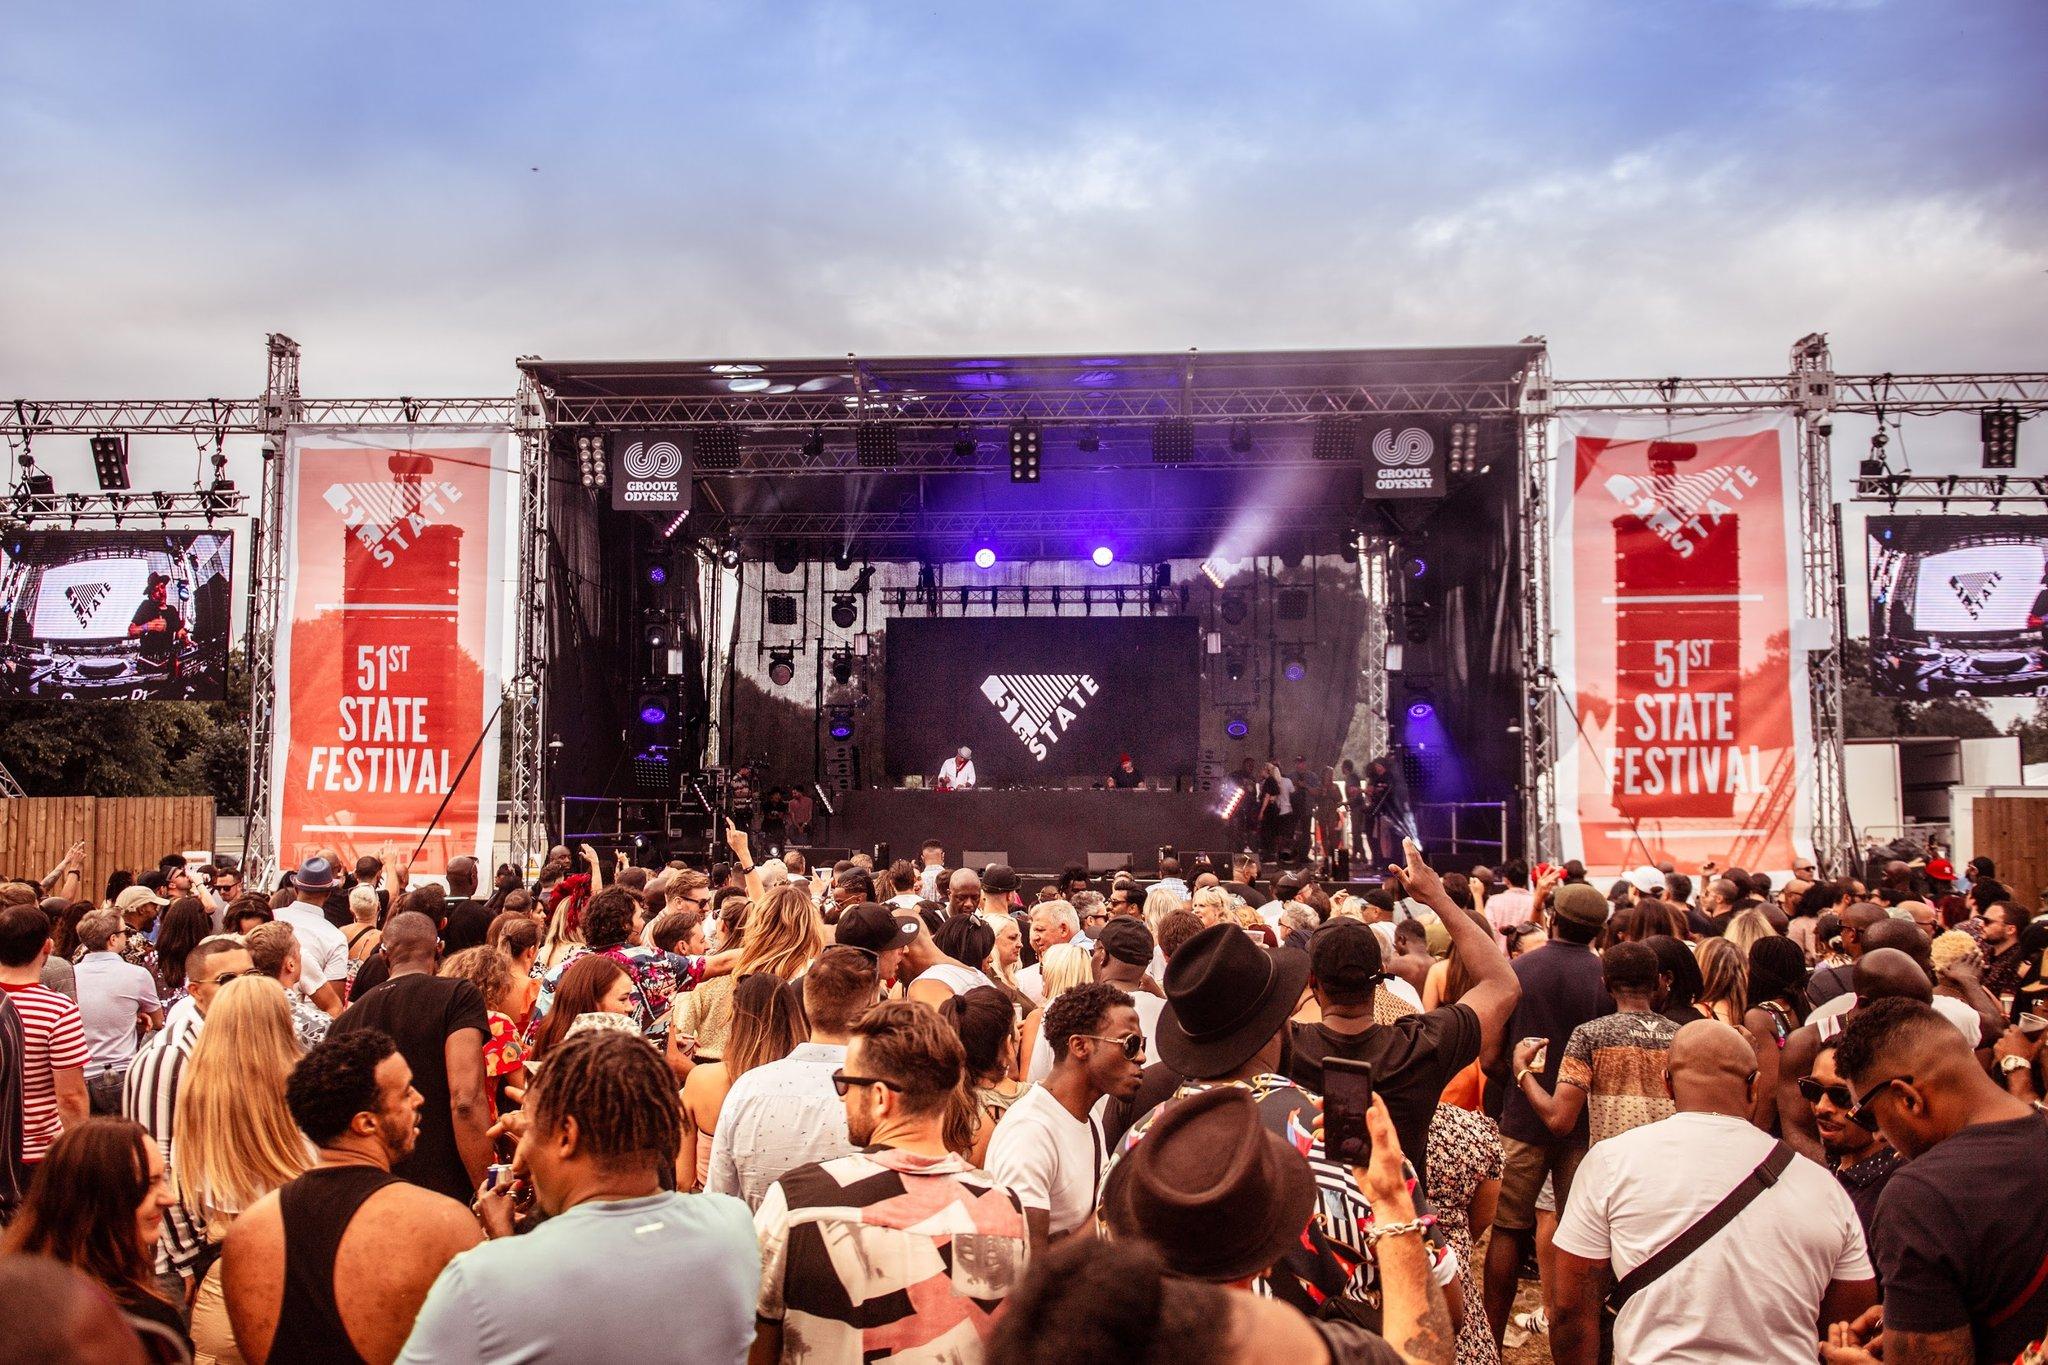 day-festivals-in-london-51st-state-festival